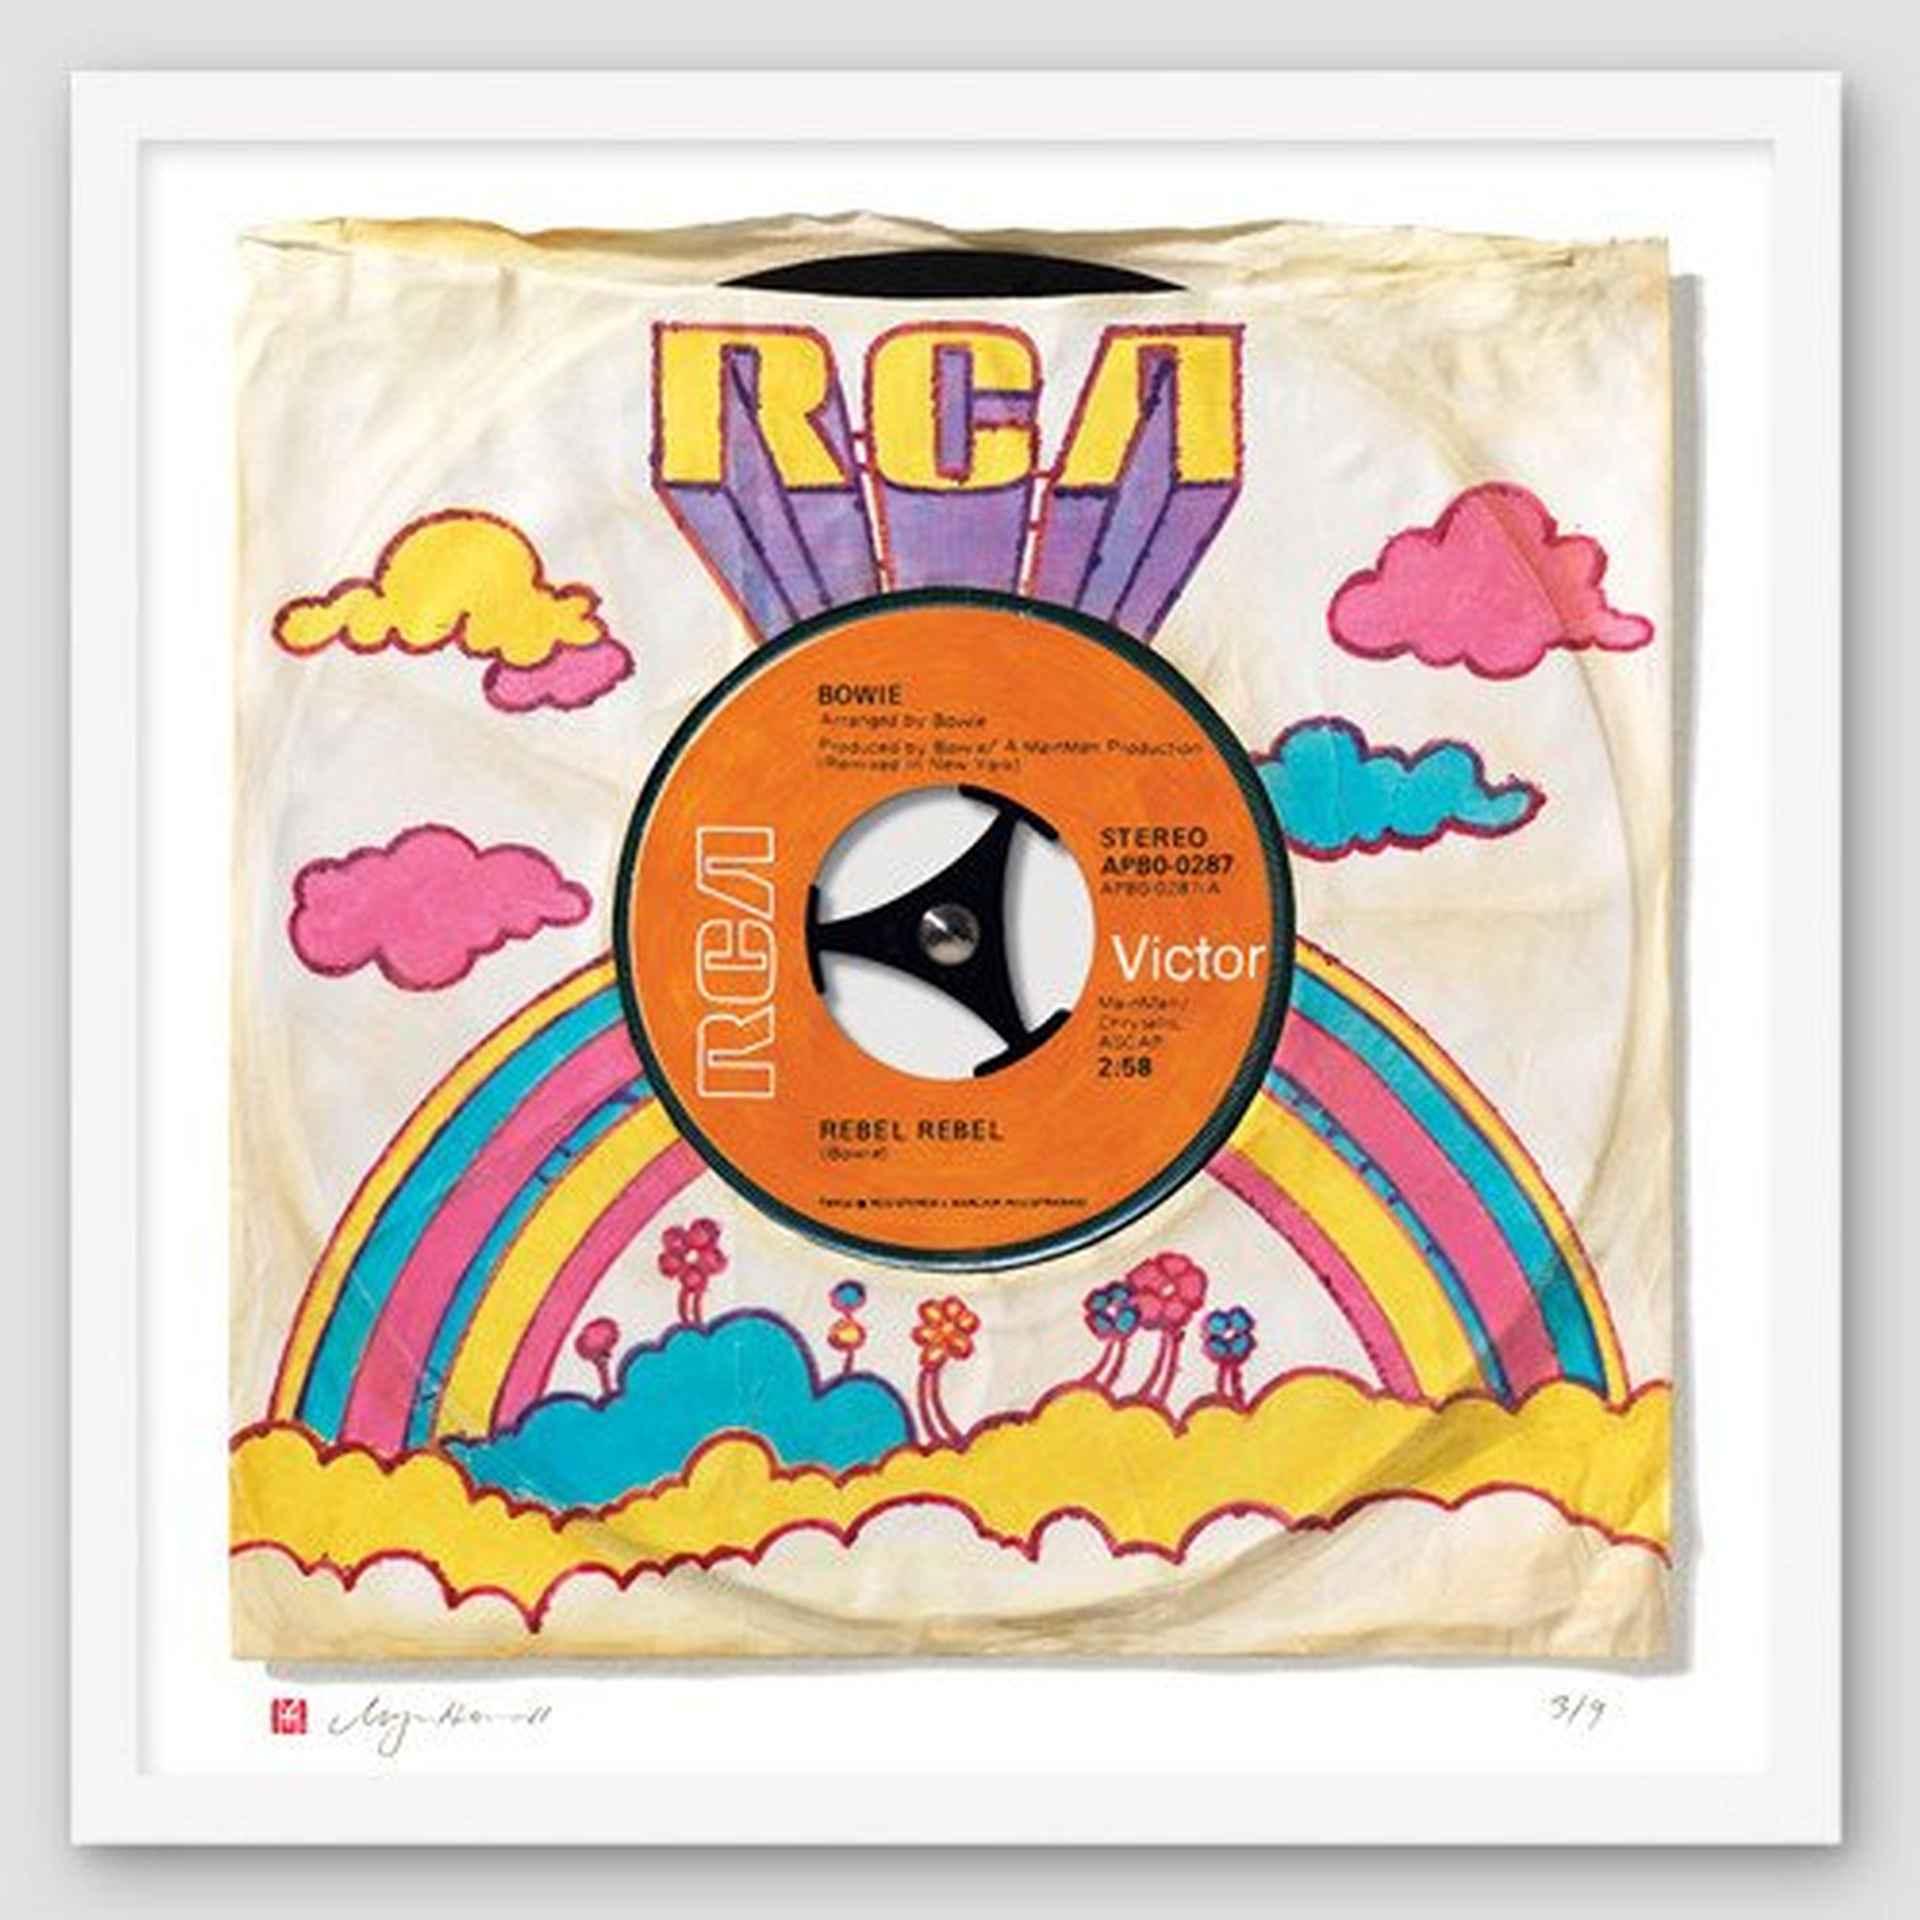 """Rebel Rebel"" by David Bowie by Morgan Howell"